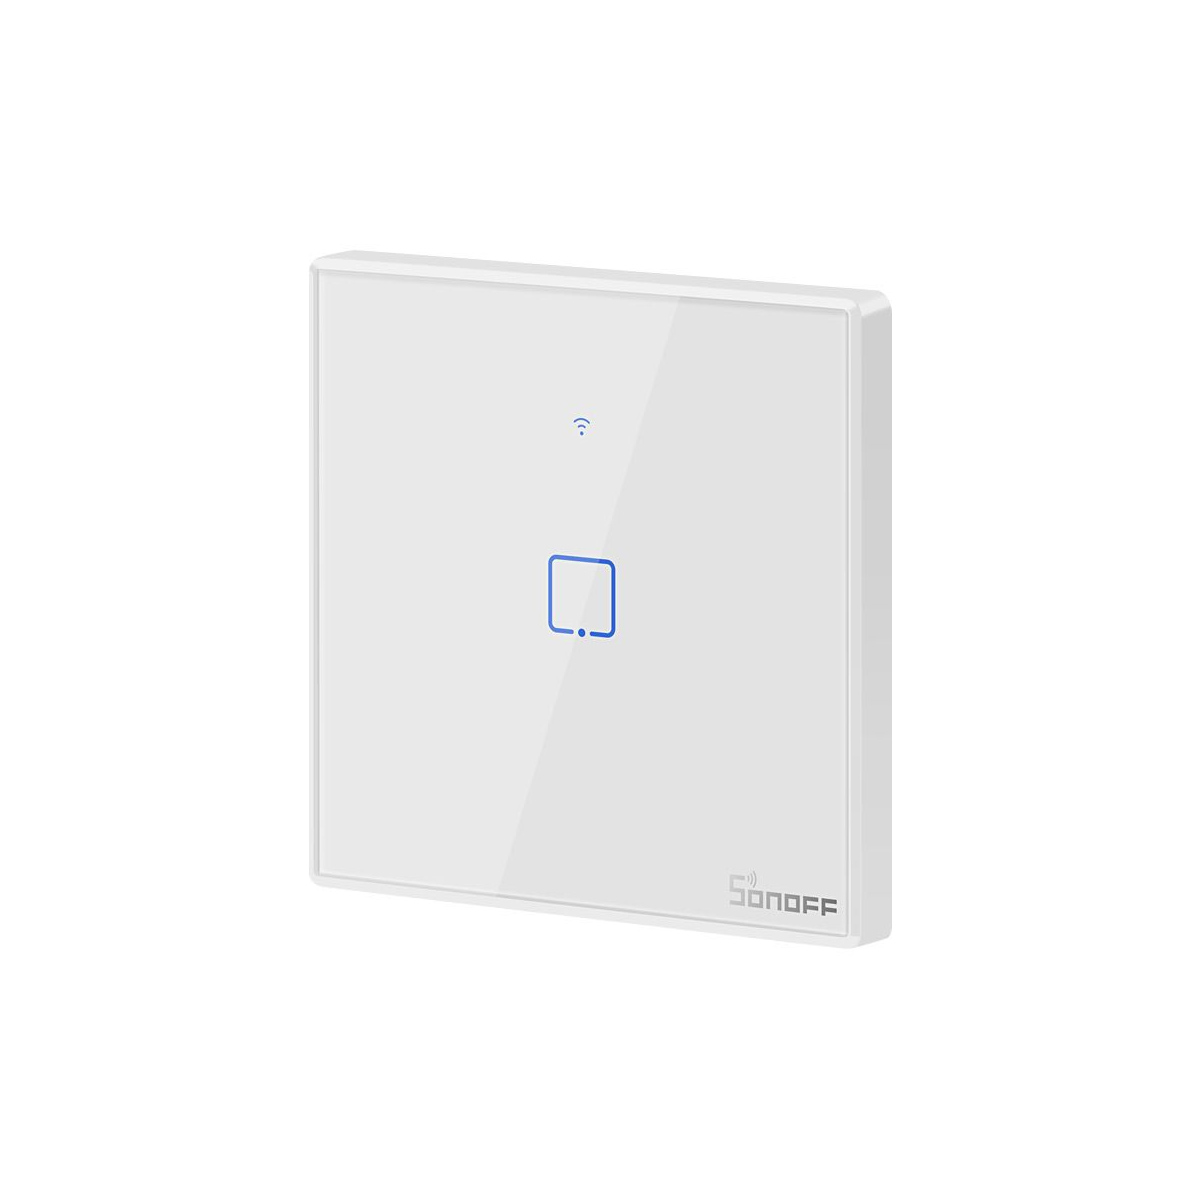 Sonoff T2EU1C-TX Single-channel Touch Light Switch Wi-Fi, Χωνευτός Διακόπτης Τοίχου - IM190314015